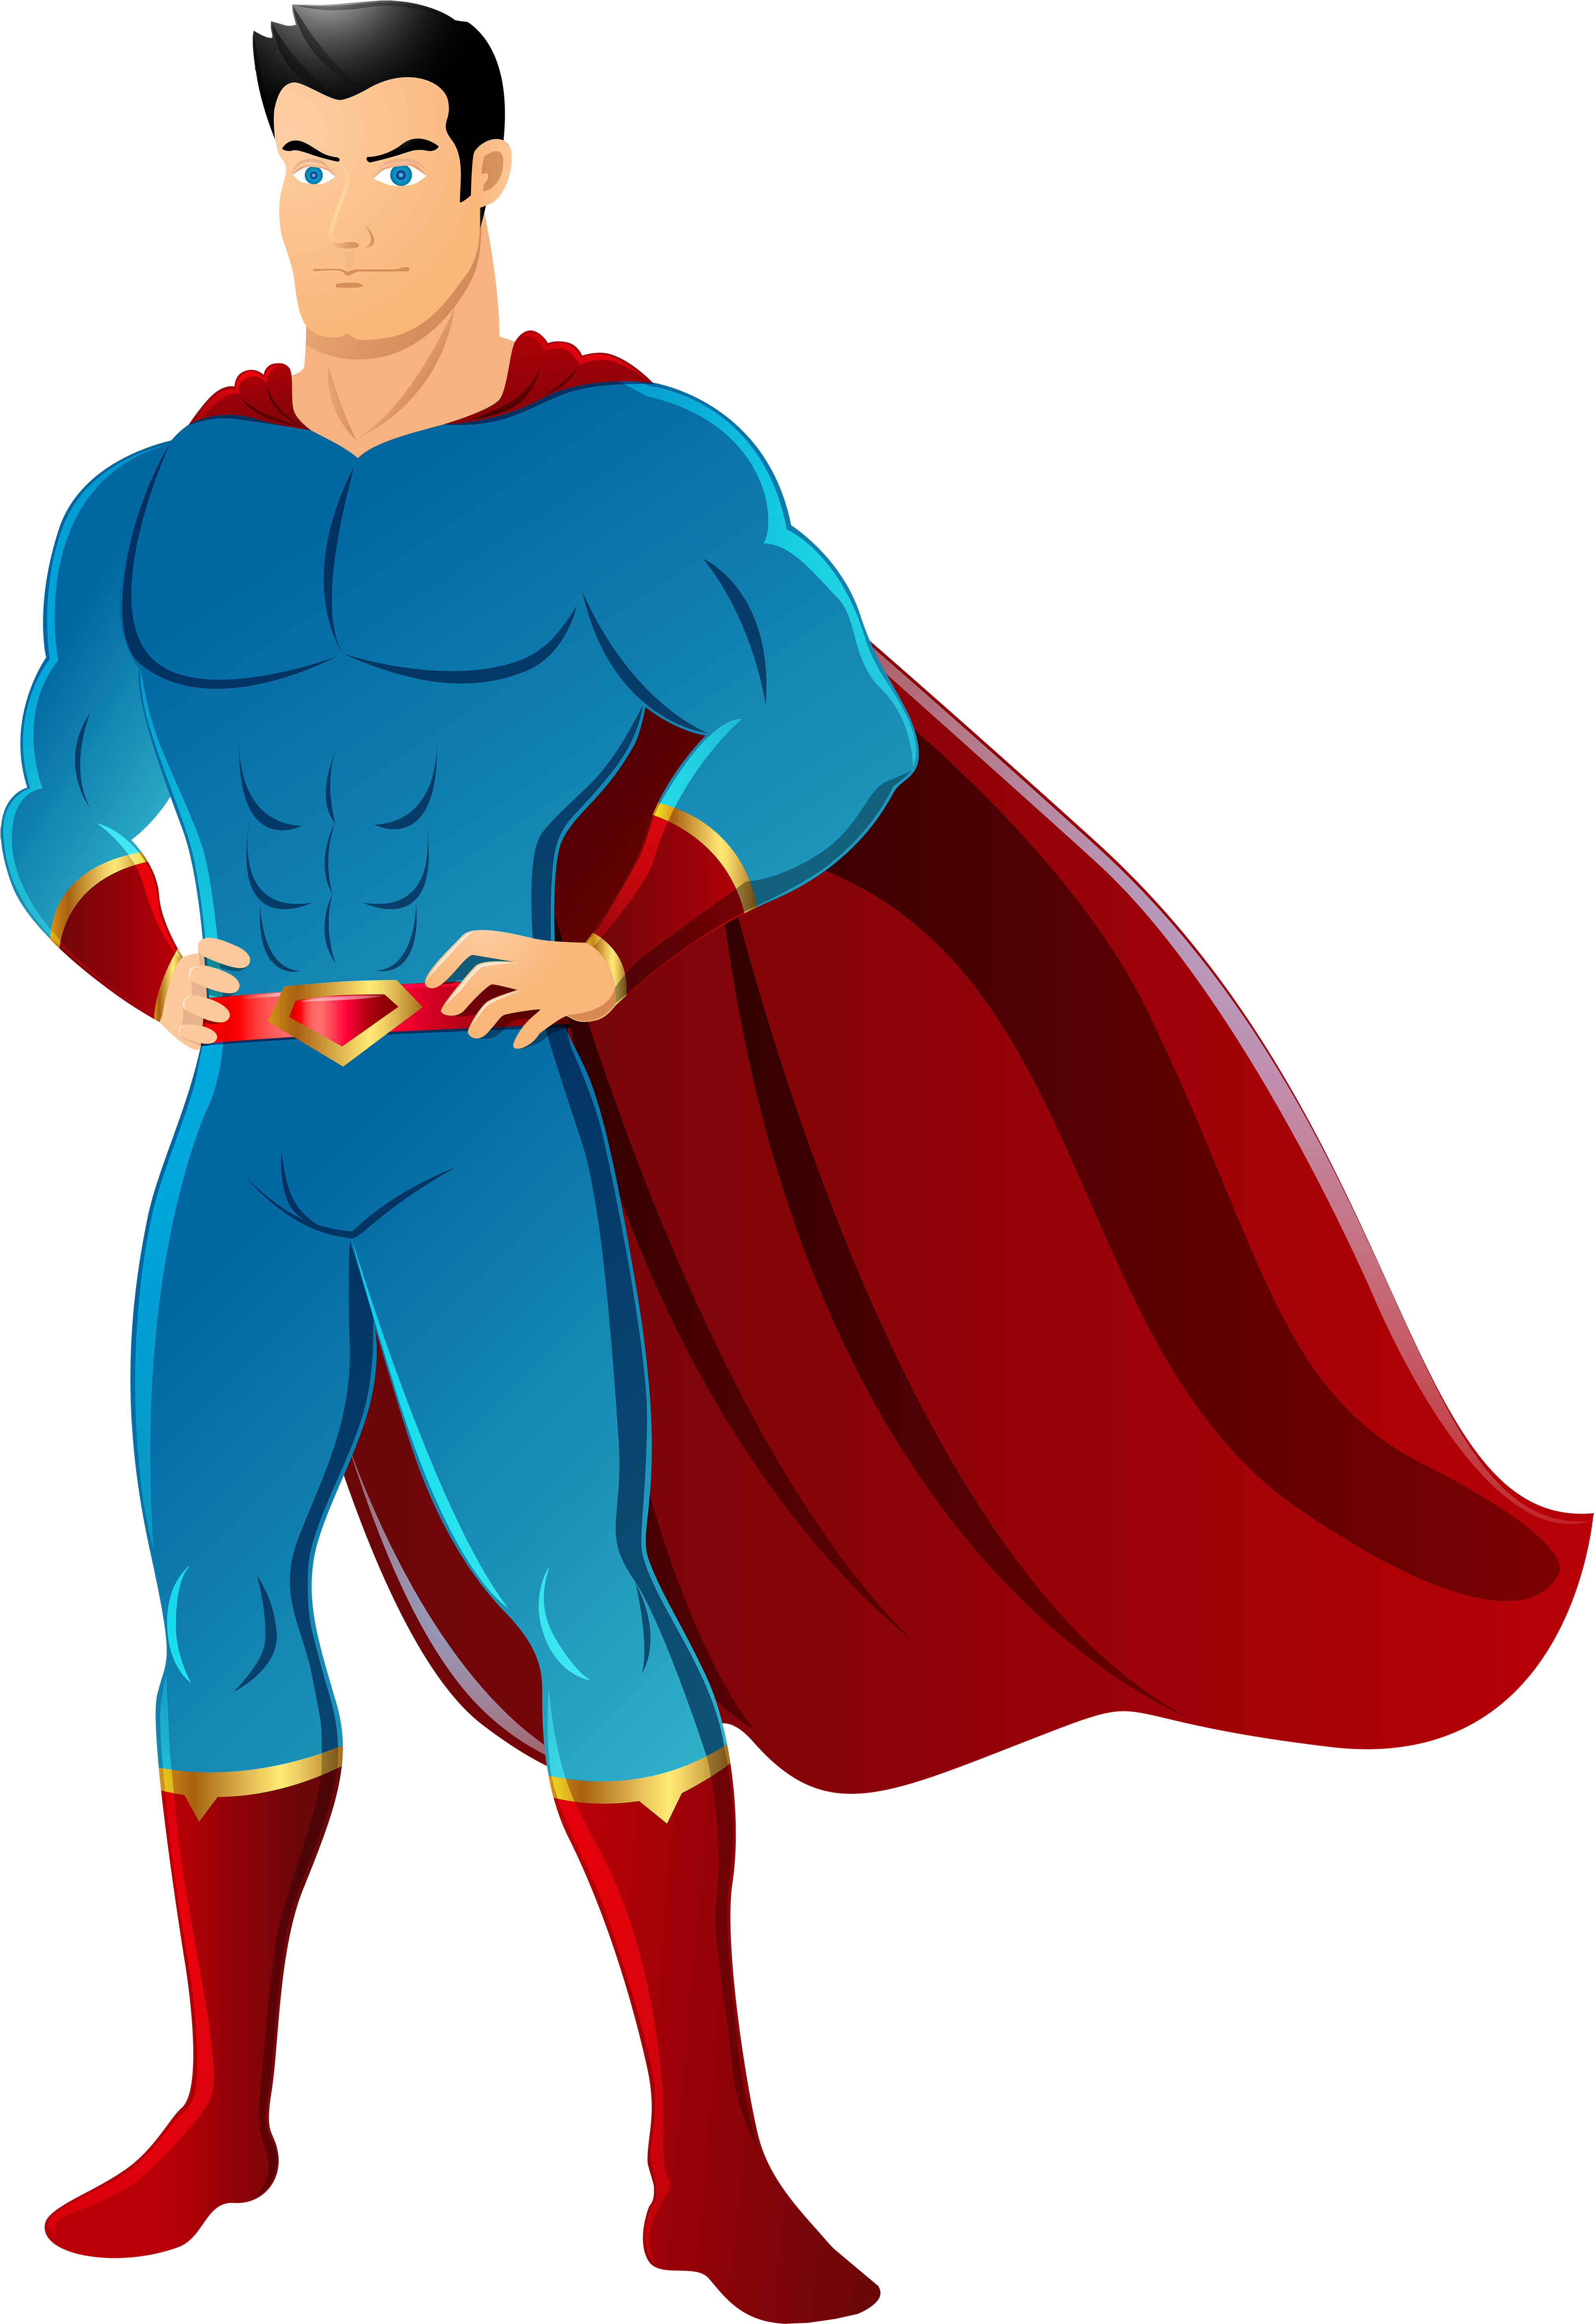 мульт картинки супергероев продаже квартир